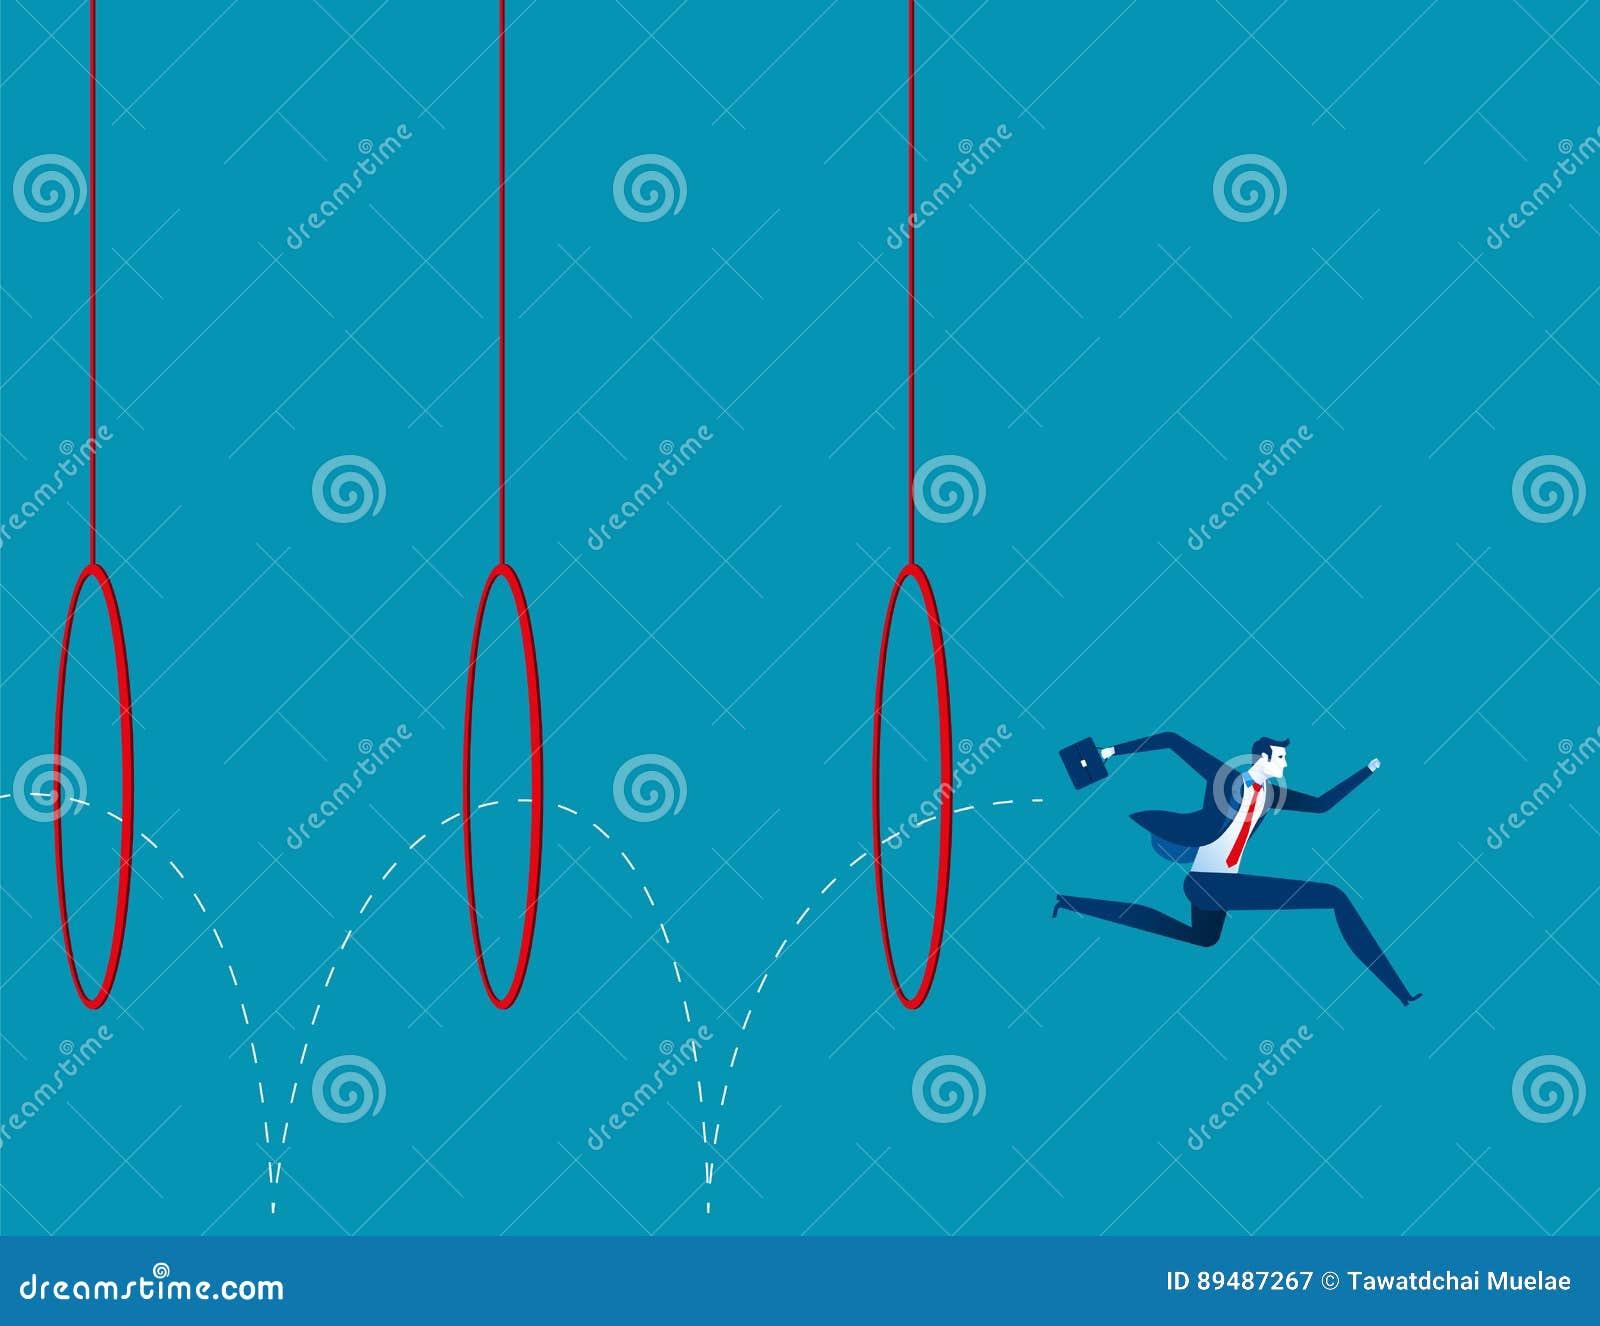 Business man jumping through hoops